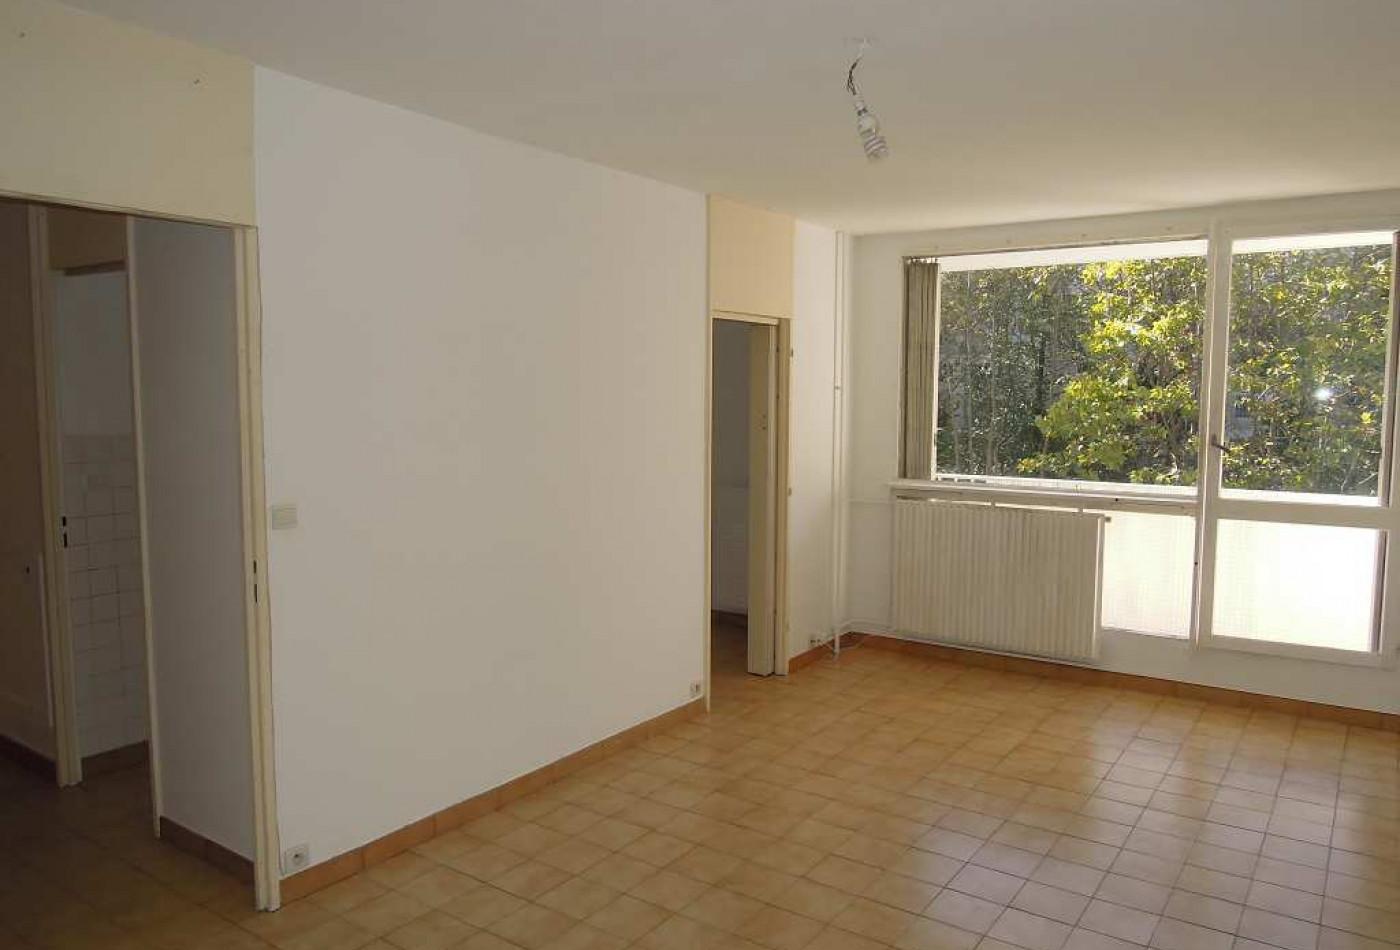 appartement en vente montpellier r f 341681506 frances immobilier. Black Bedroom Furniture Sets. Home Design Ideas